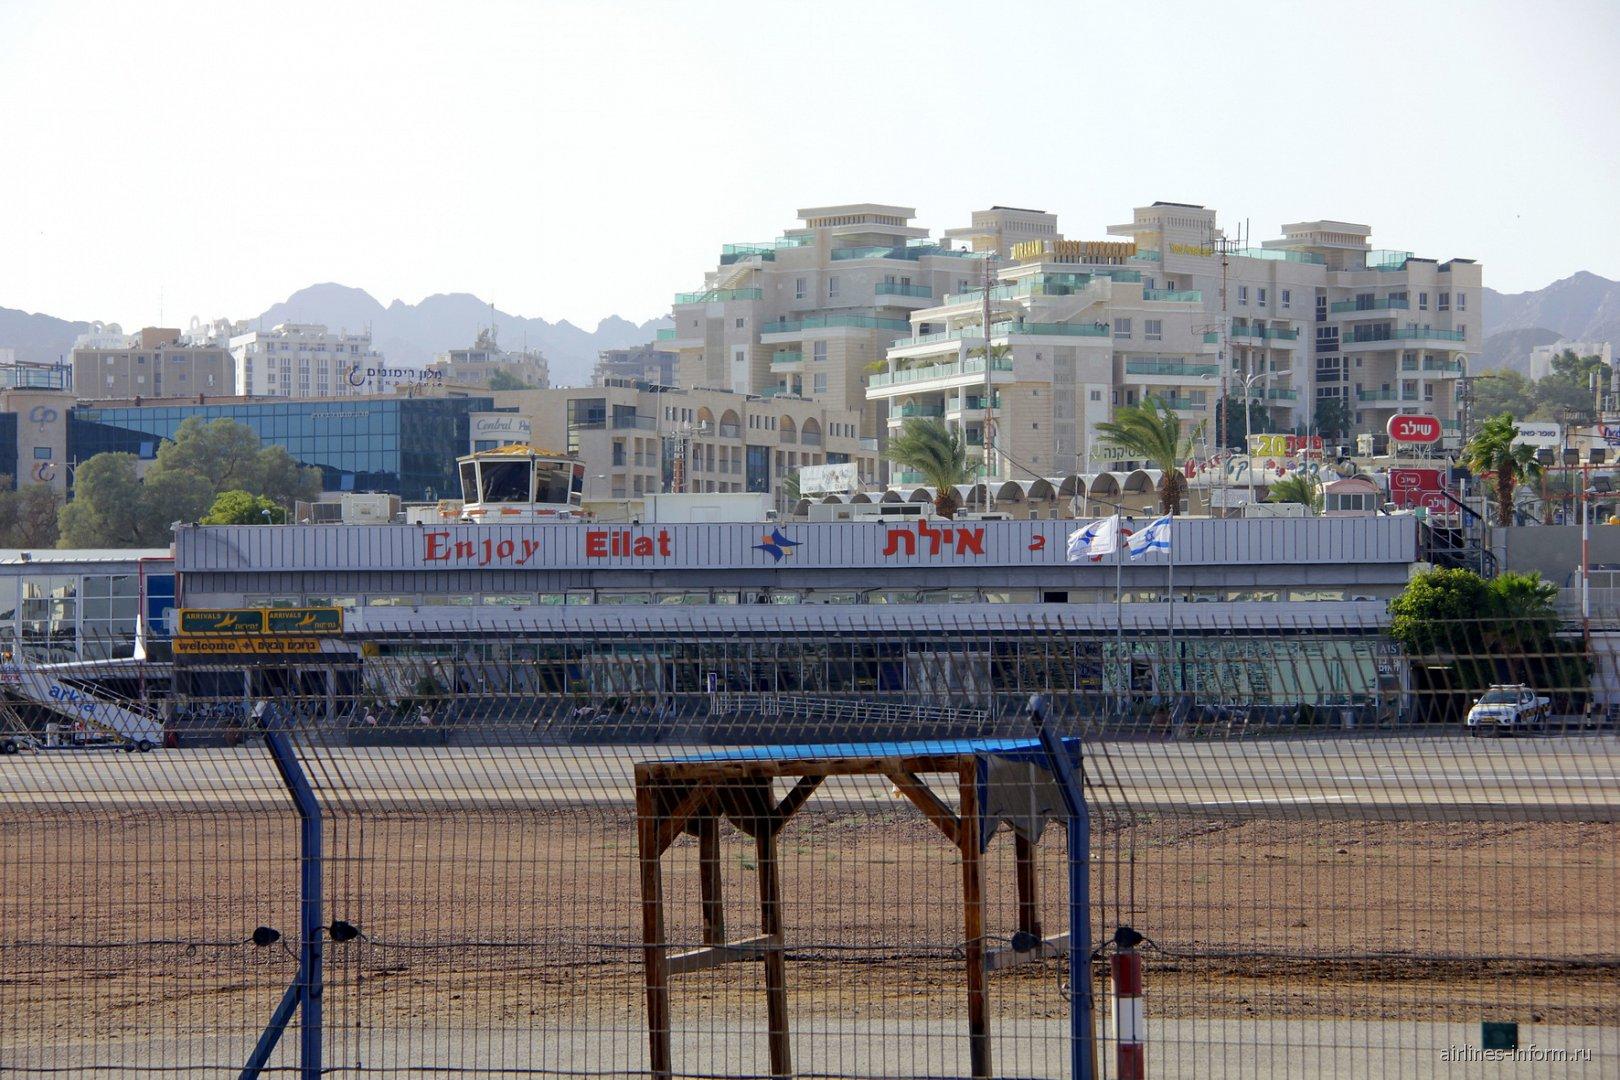 Аэровокзал аэропорта Эйлат